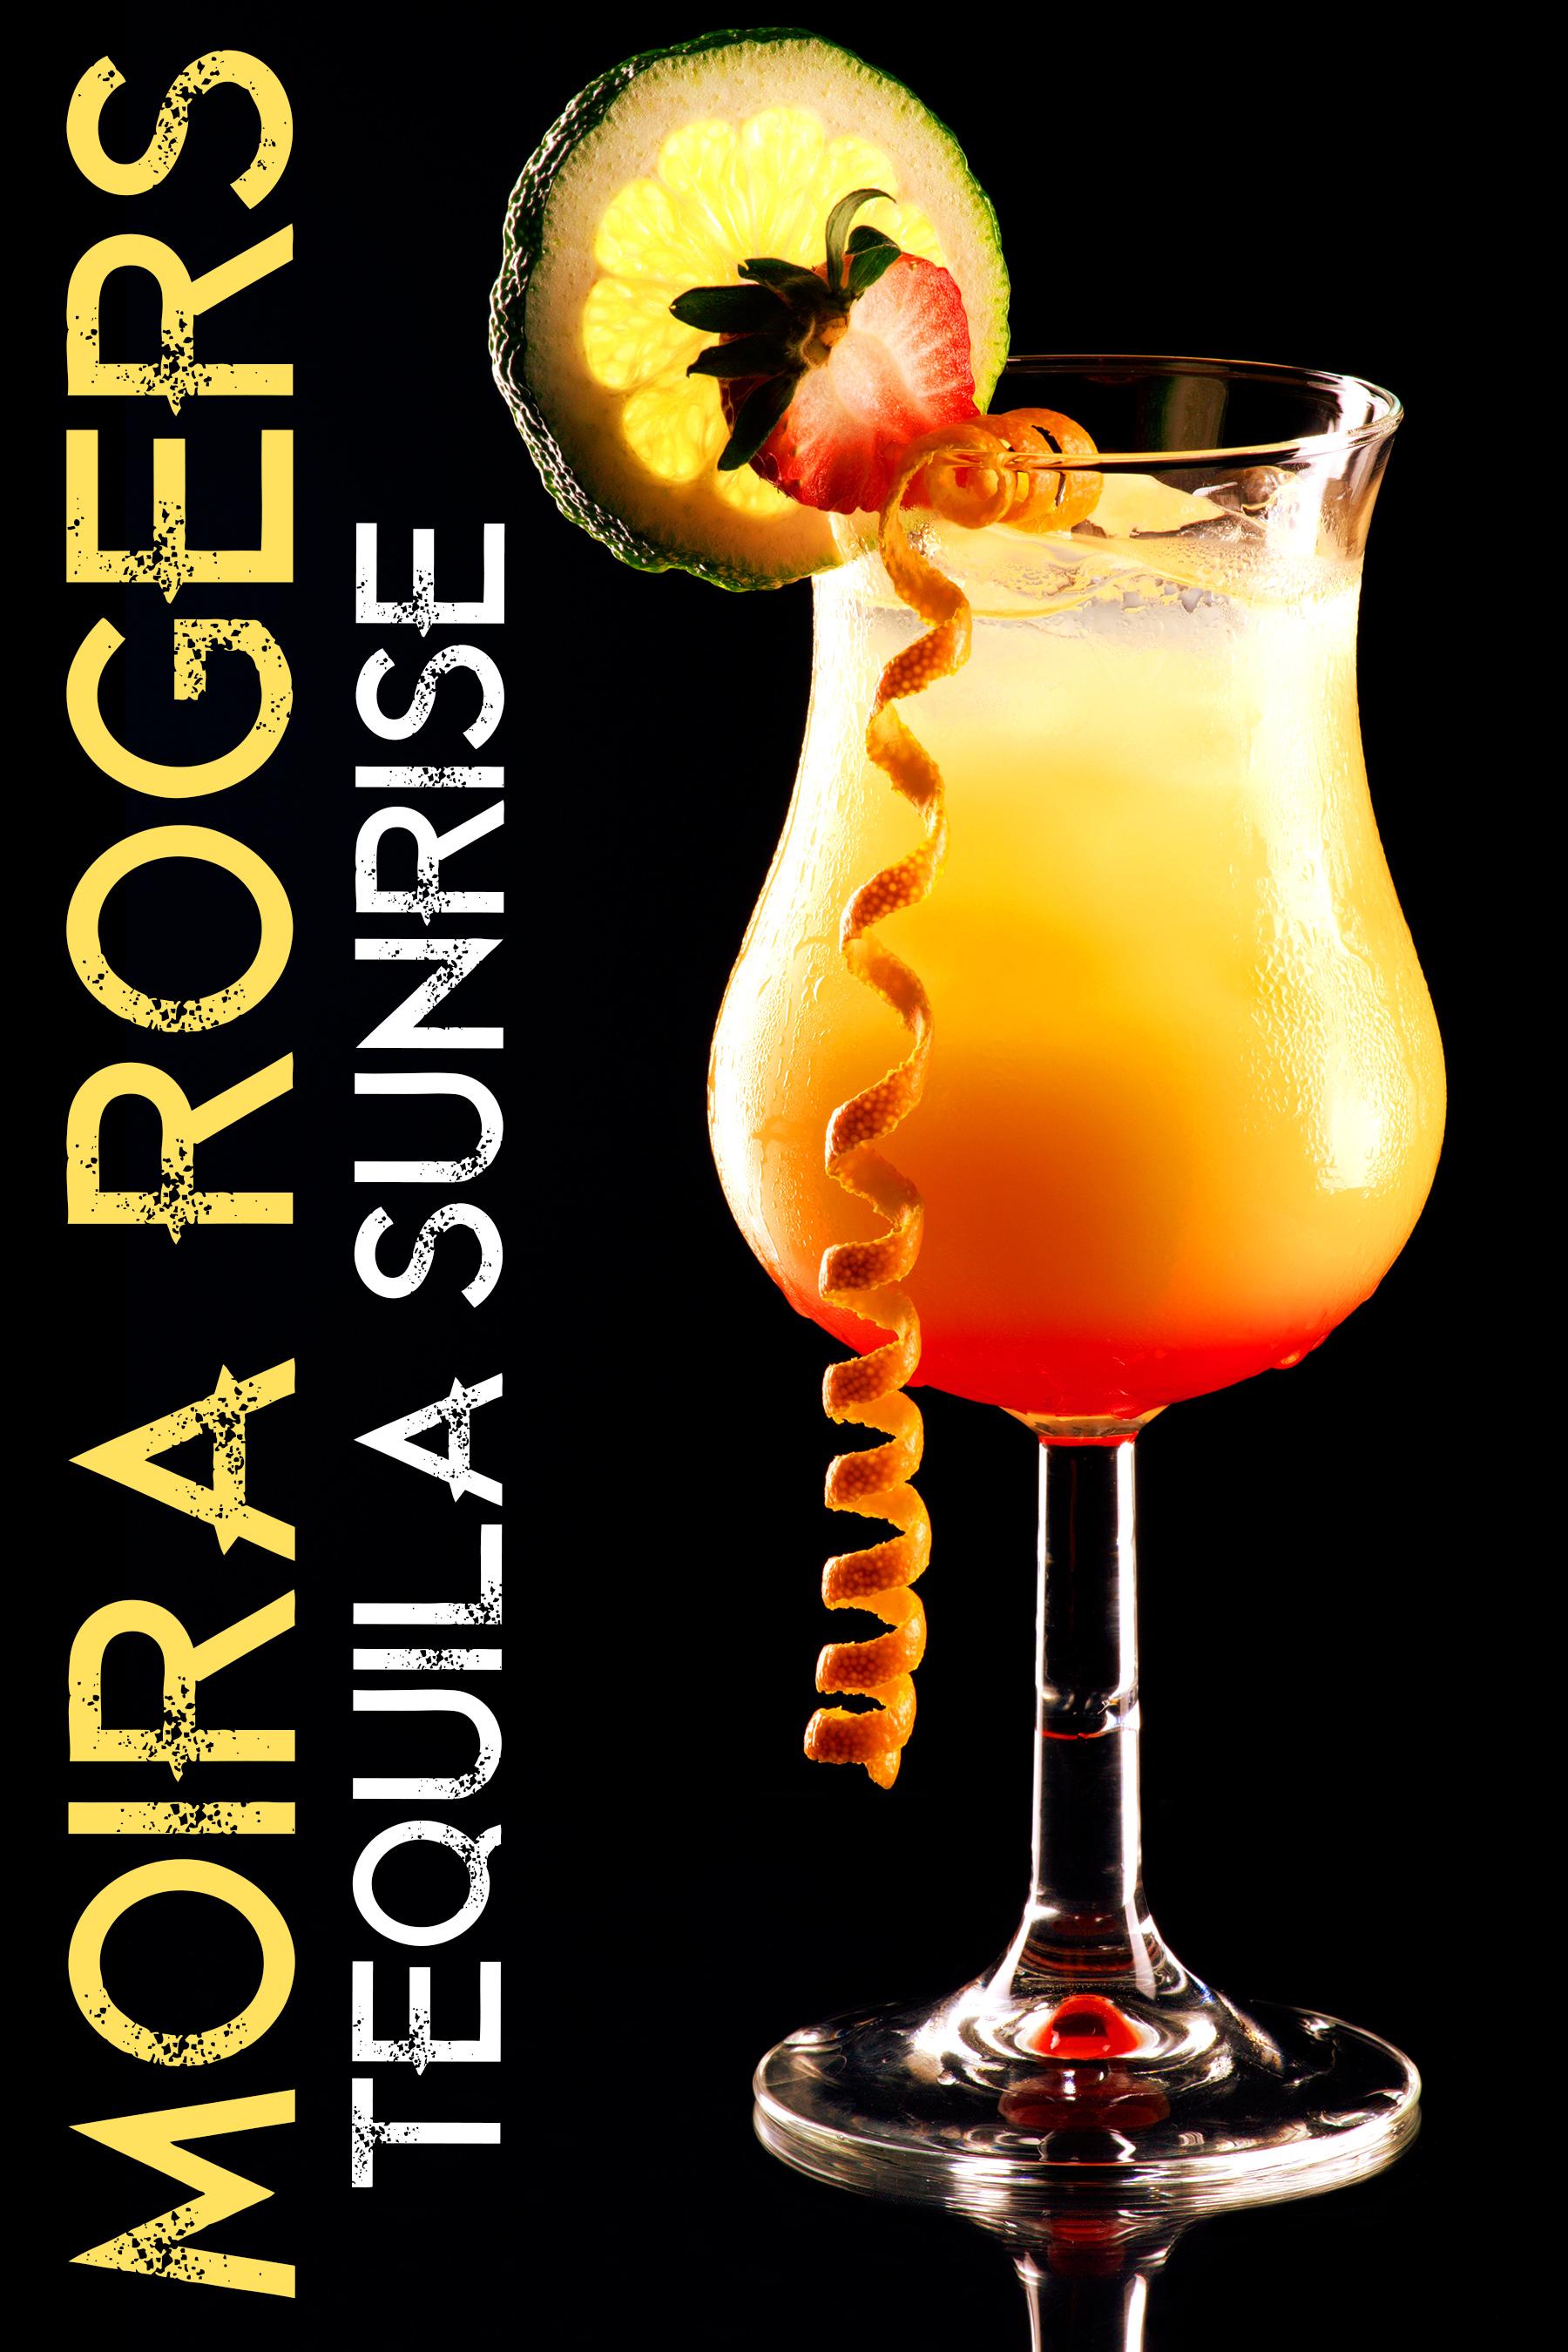 Moira Rogers - Tequila Sunrise (Last Call #3)